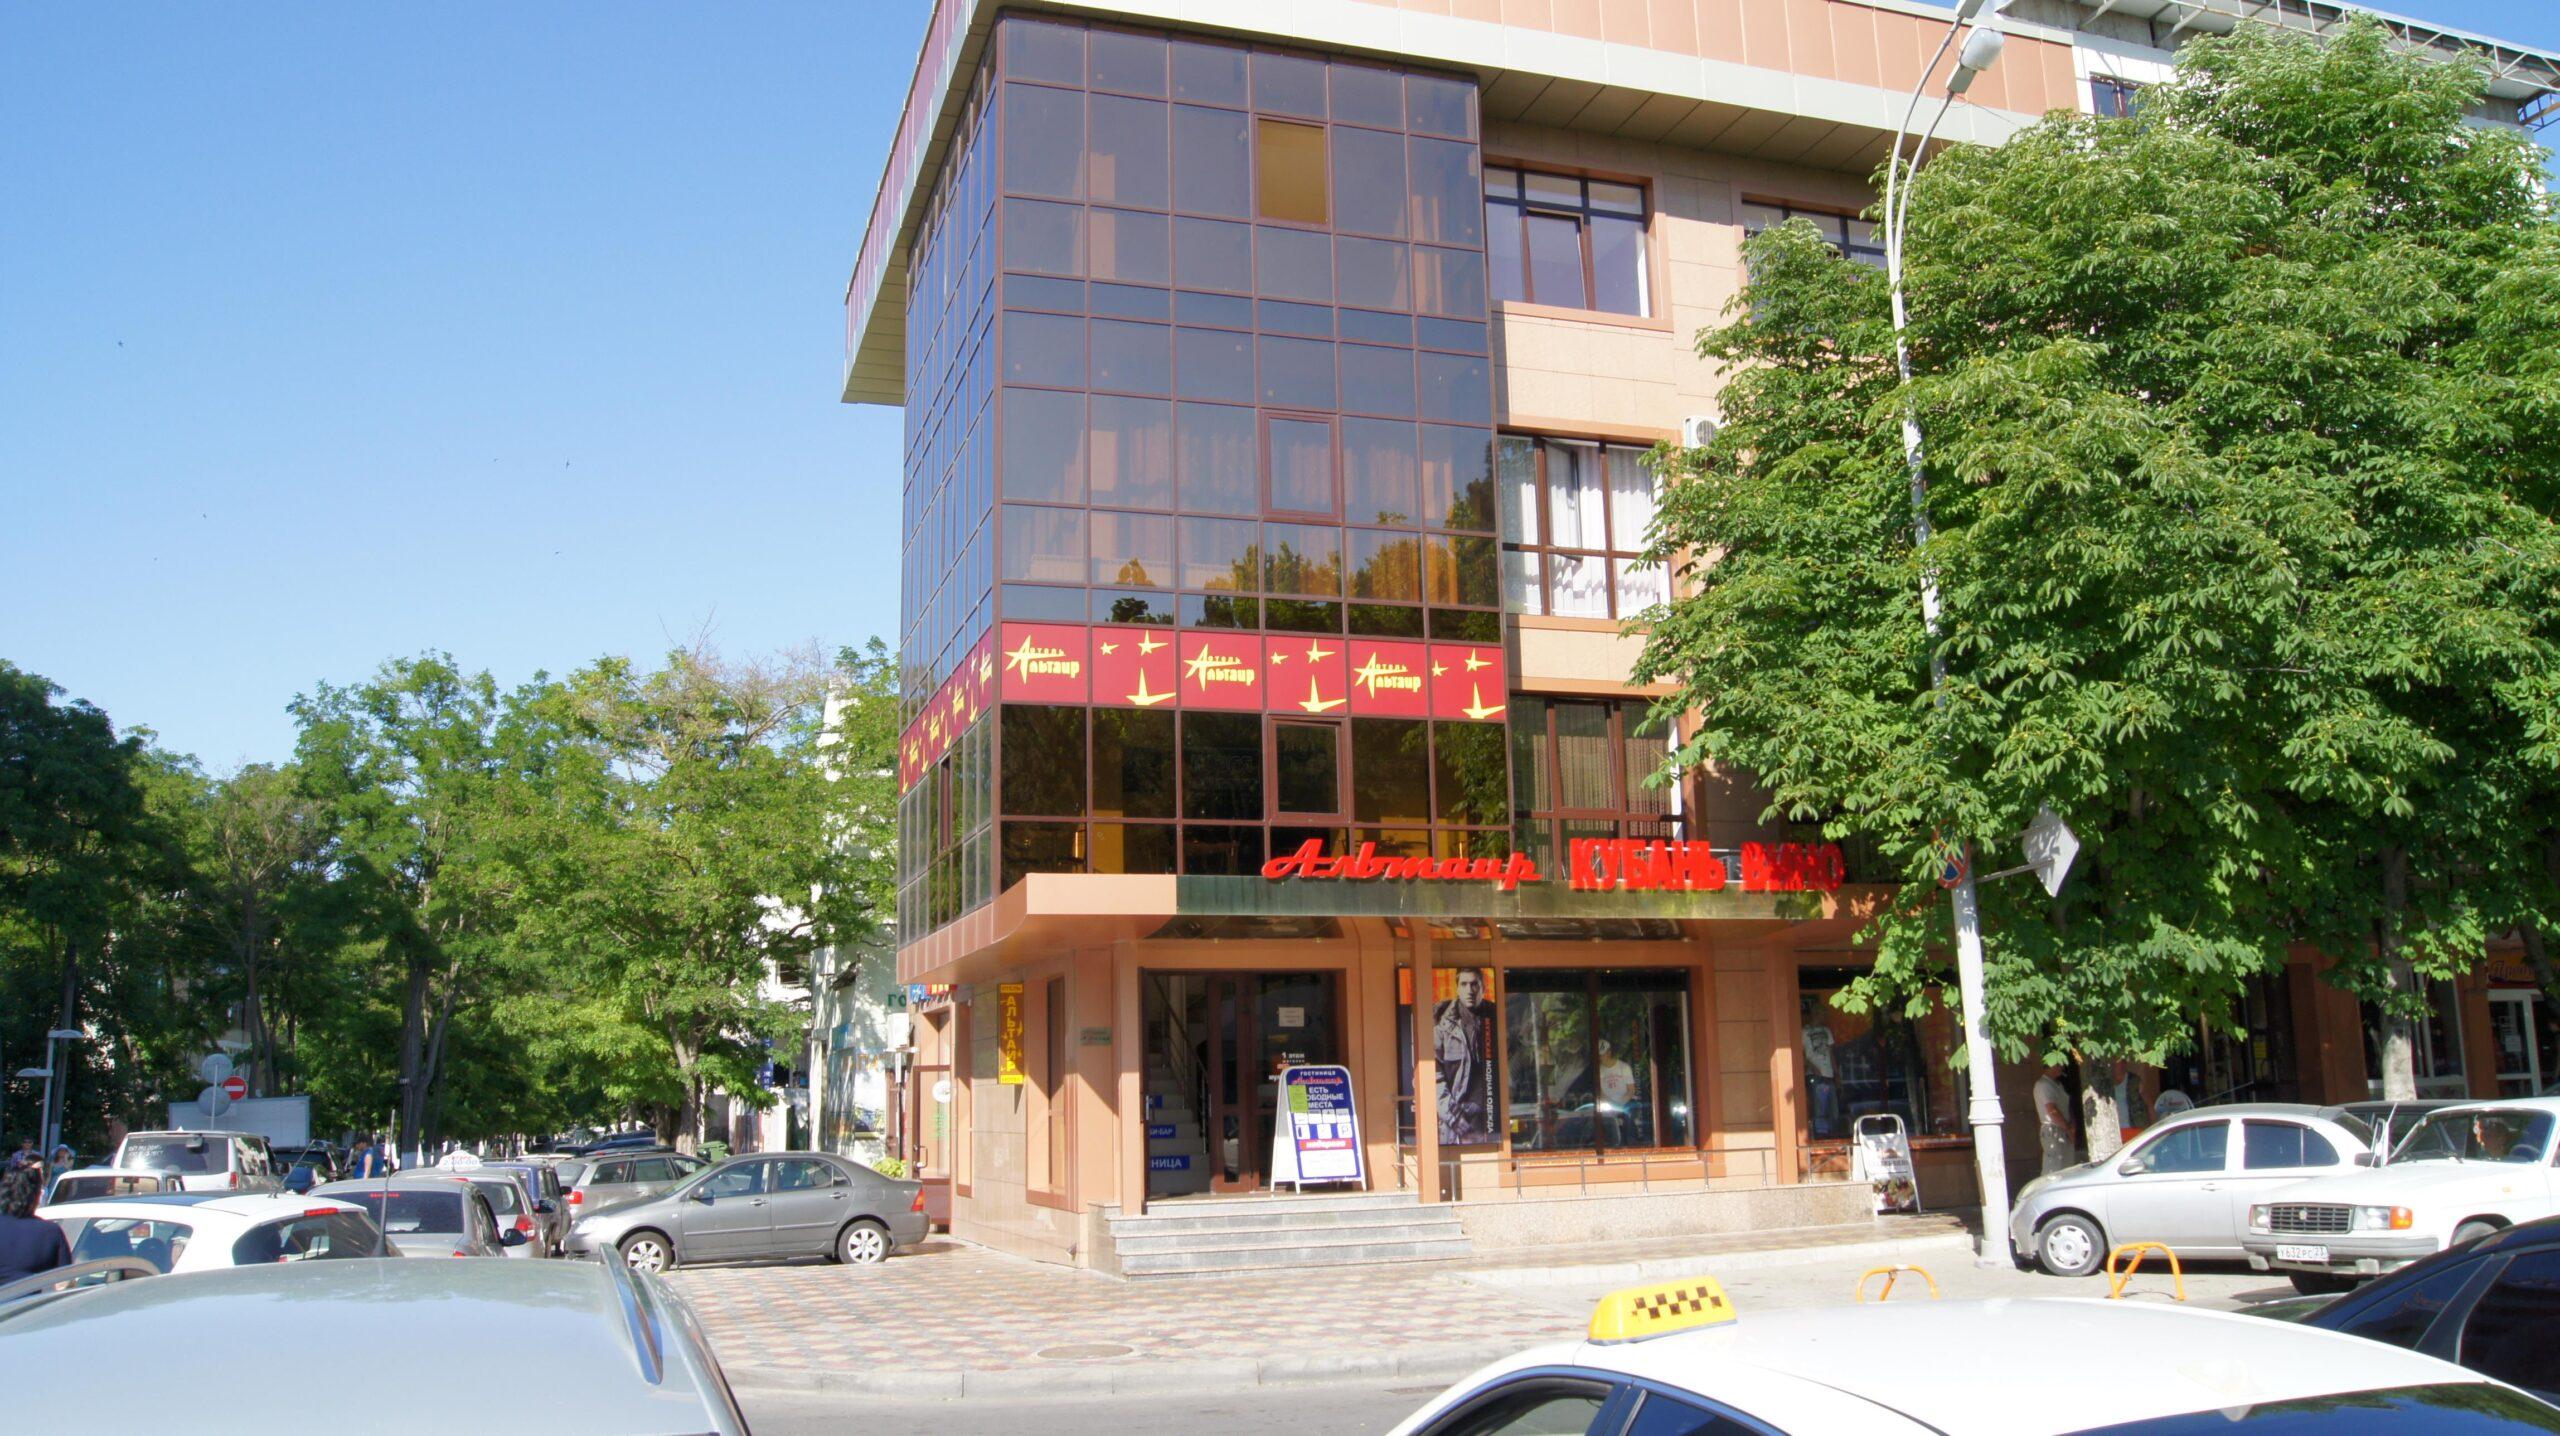 Тур в Россию Адлер 18 632 руб. чел.